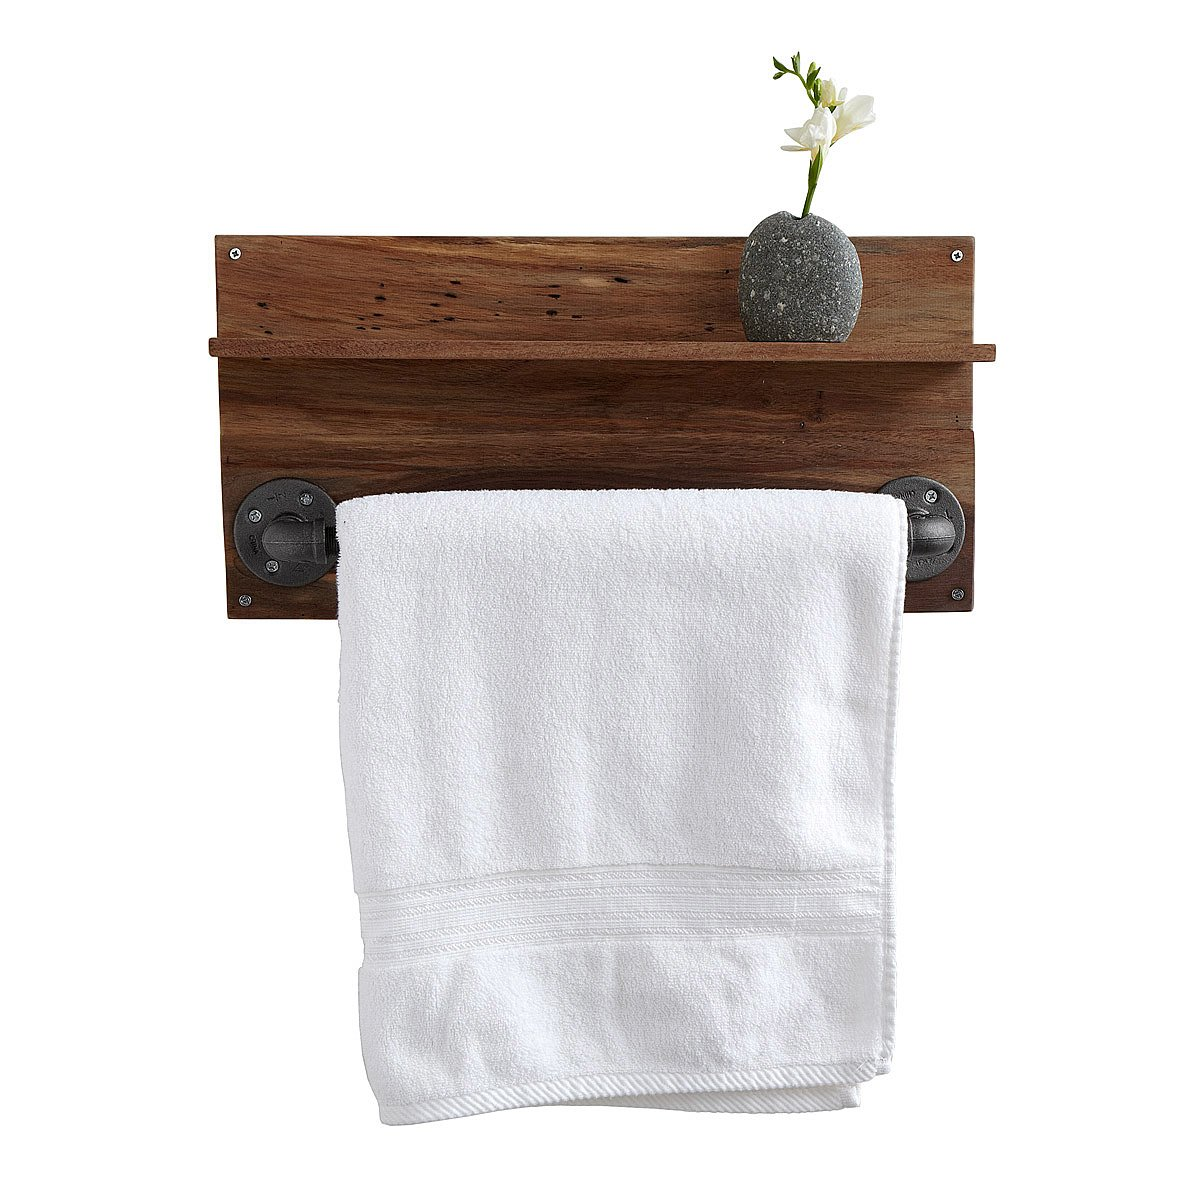 Wood towel bars for bathrooms - Reclaimed Walnut Towel Rack 1 Thumbnail